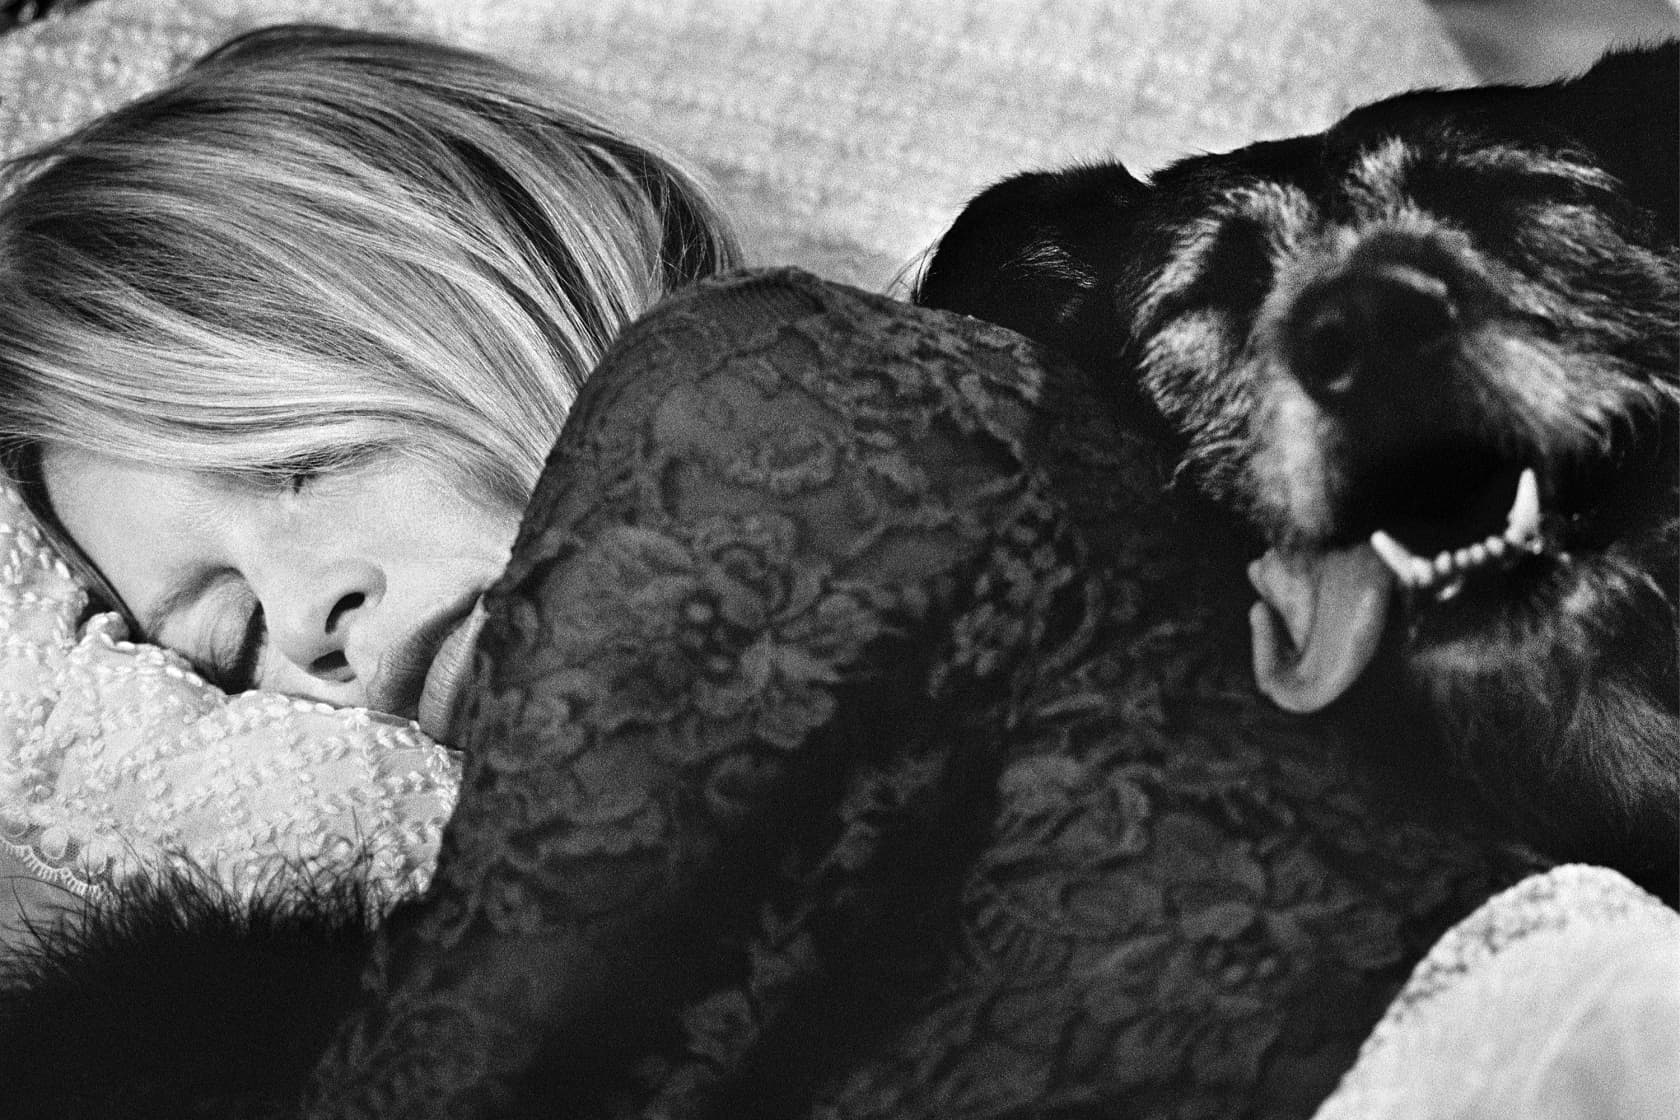 Terry O'Neill Brigitte Bardot in 'Les Novices' Lifetime Gelatin Silver Print